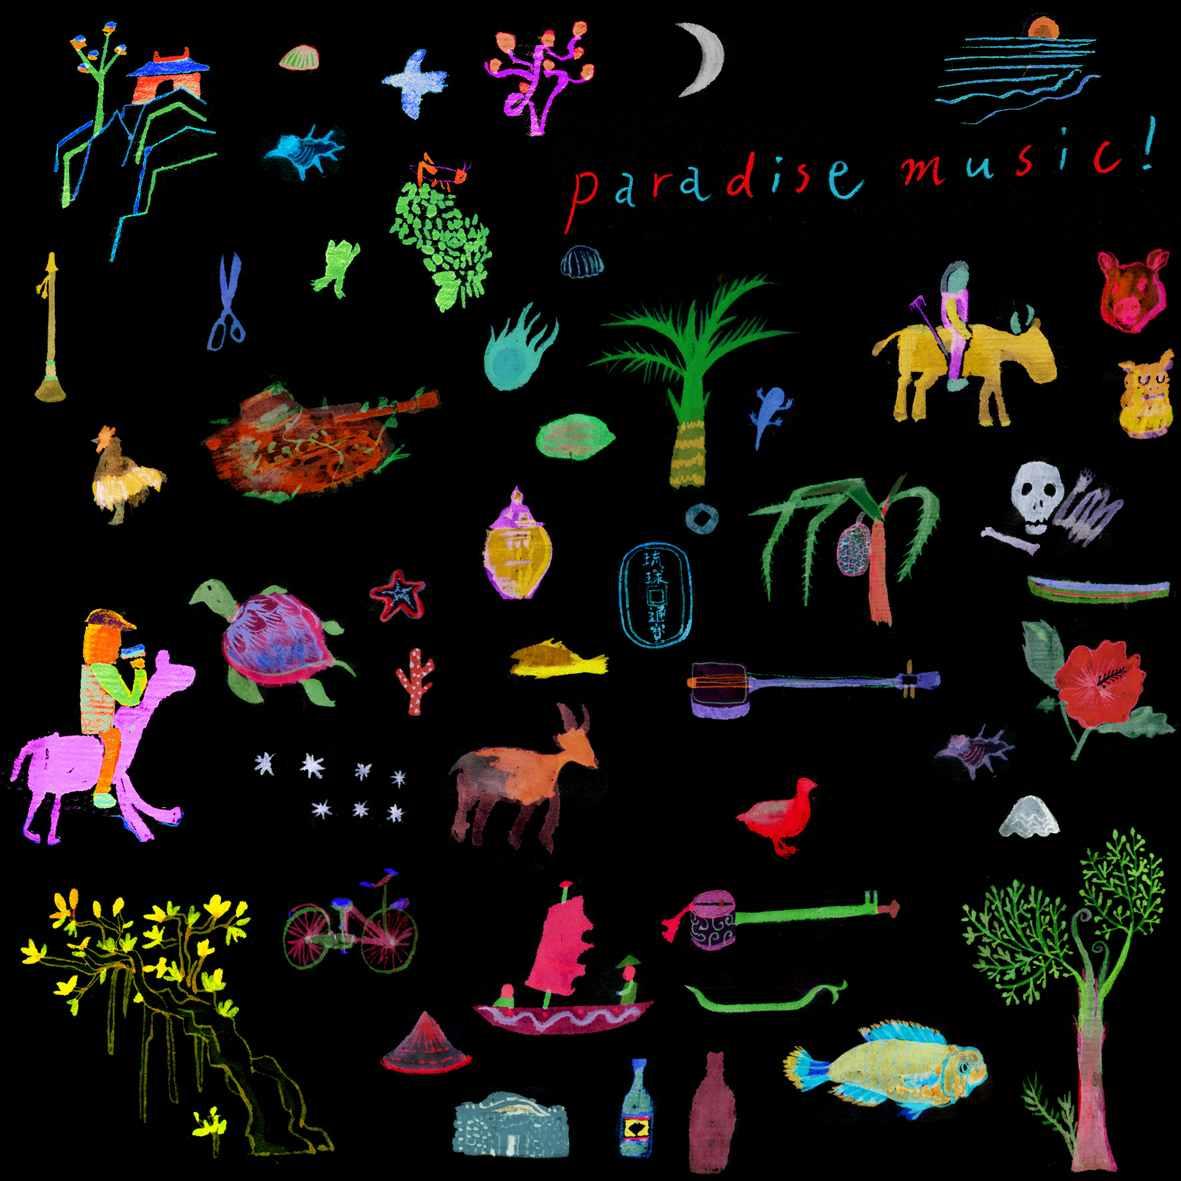 AUR-8 桃源楽 trans- PARADISE MUSIC / 吉育